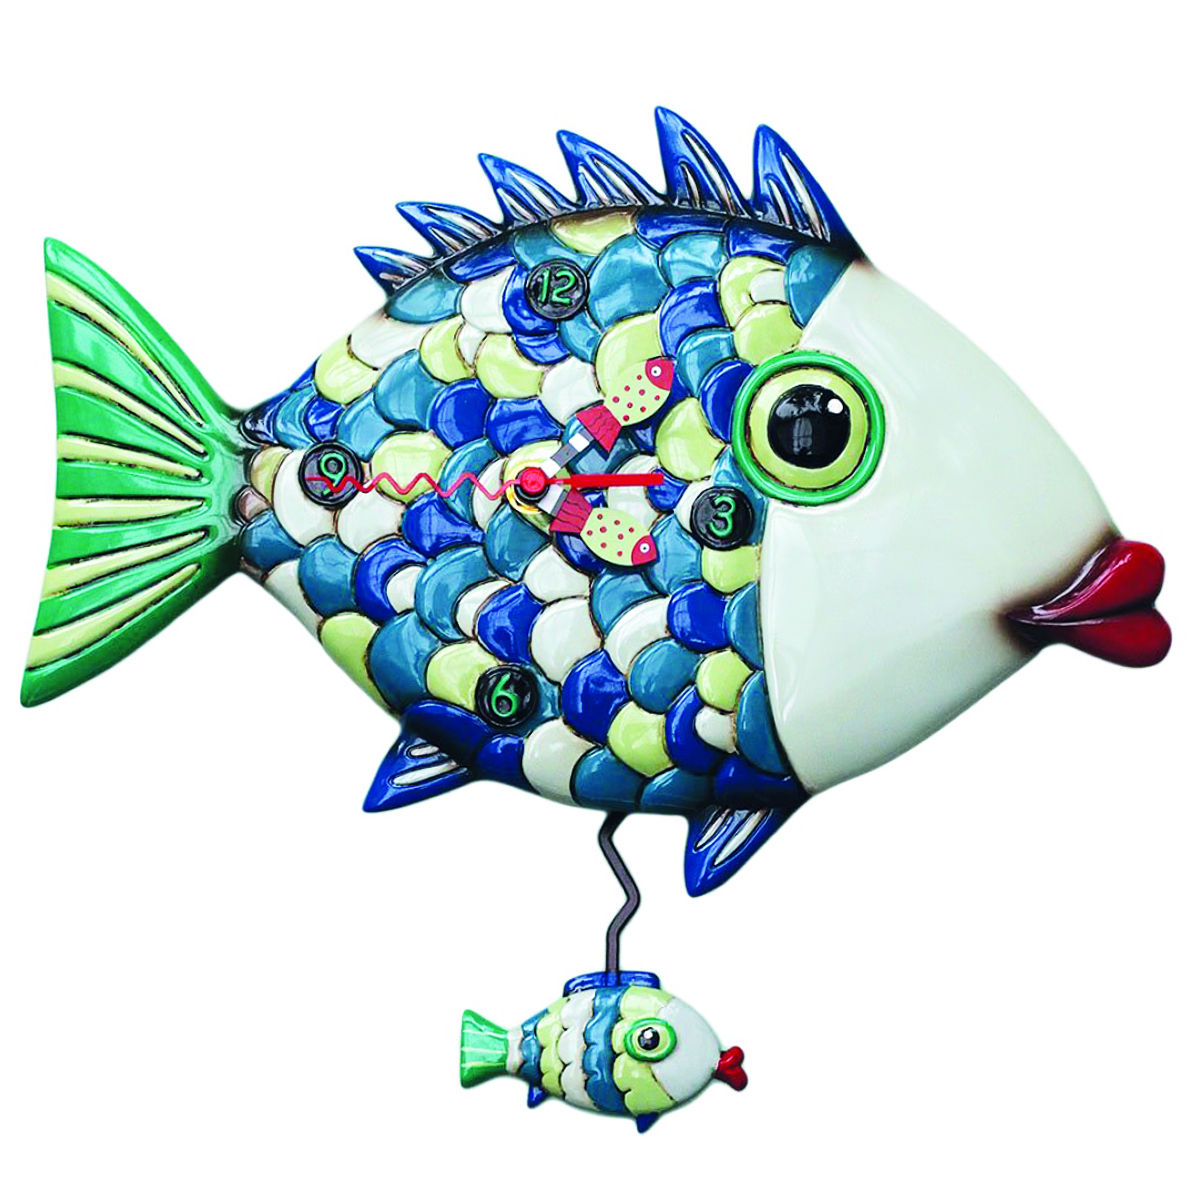 Horloge Murale \'Allen Designs\' vert bleu (poisson) - 32x28 cm - [P9089]